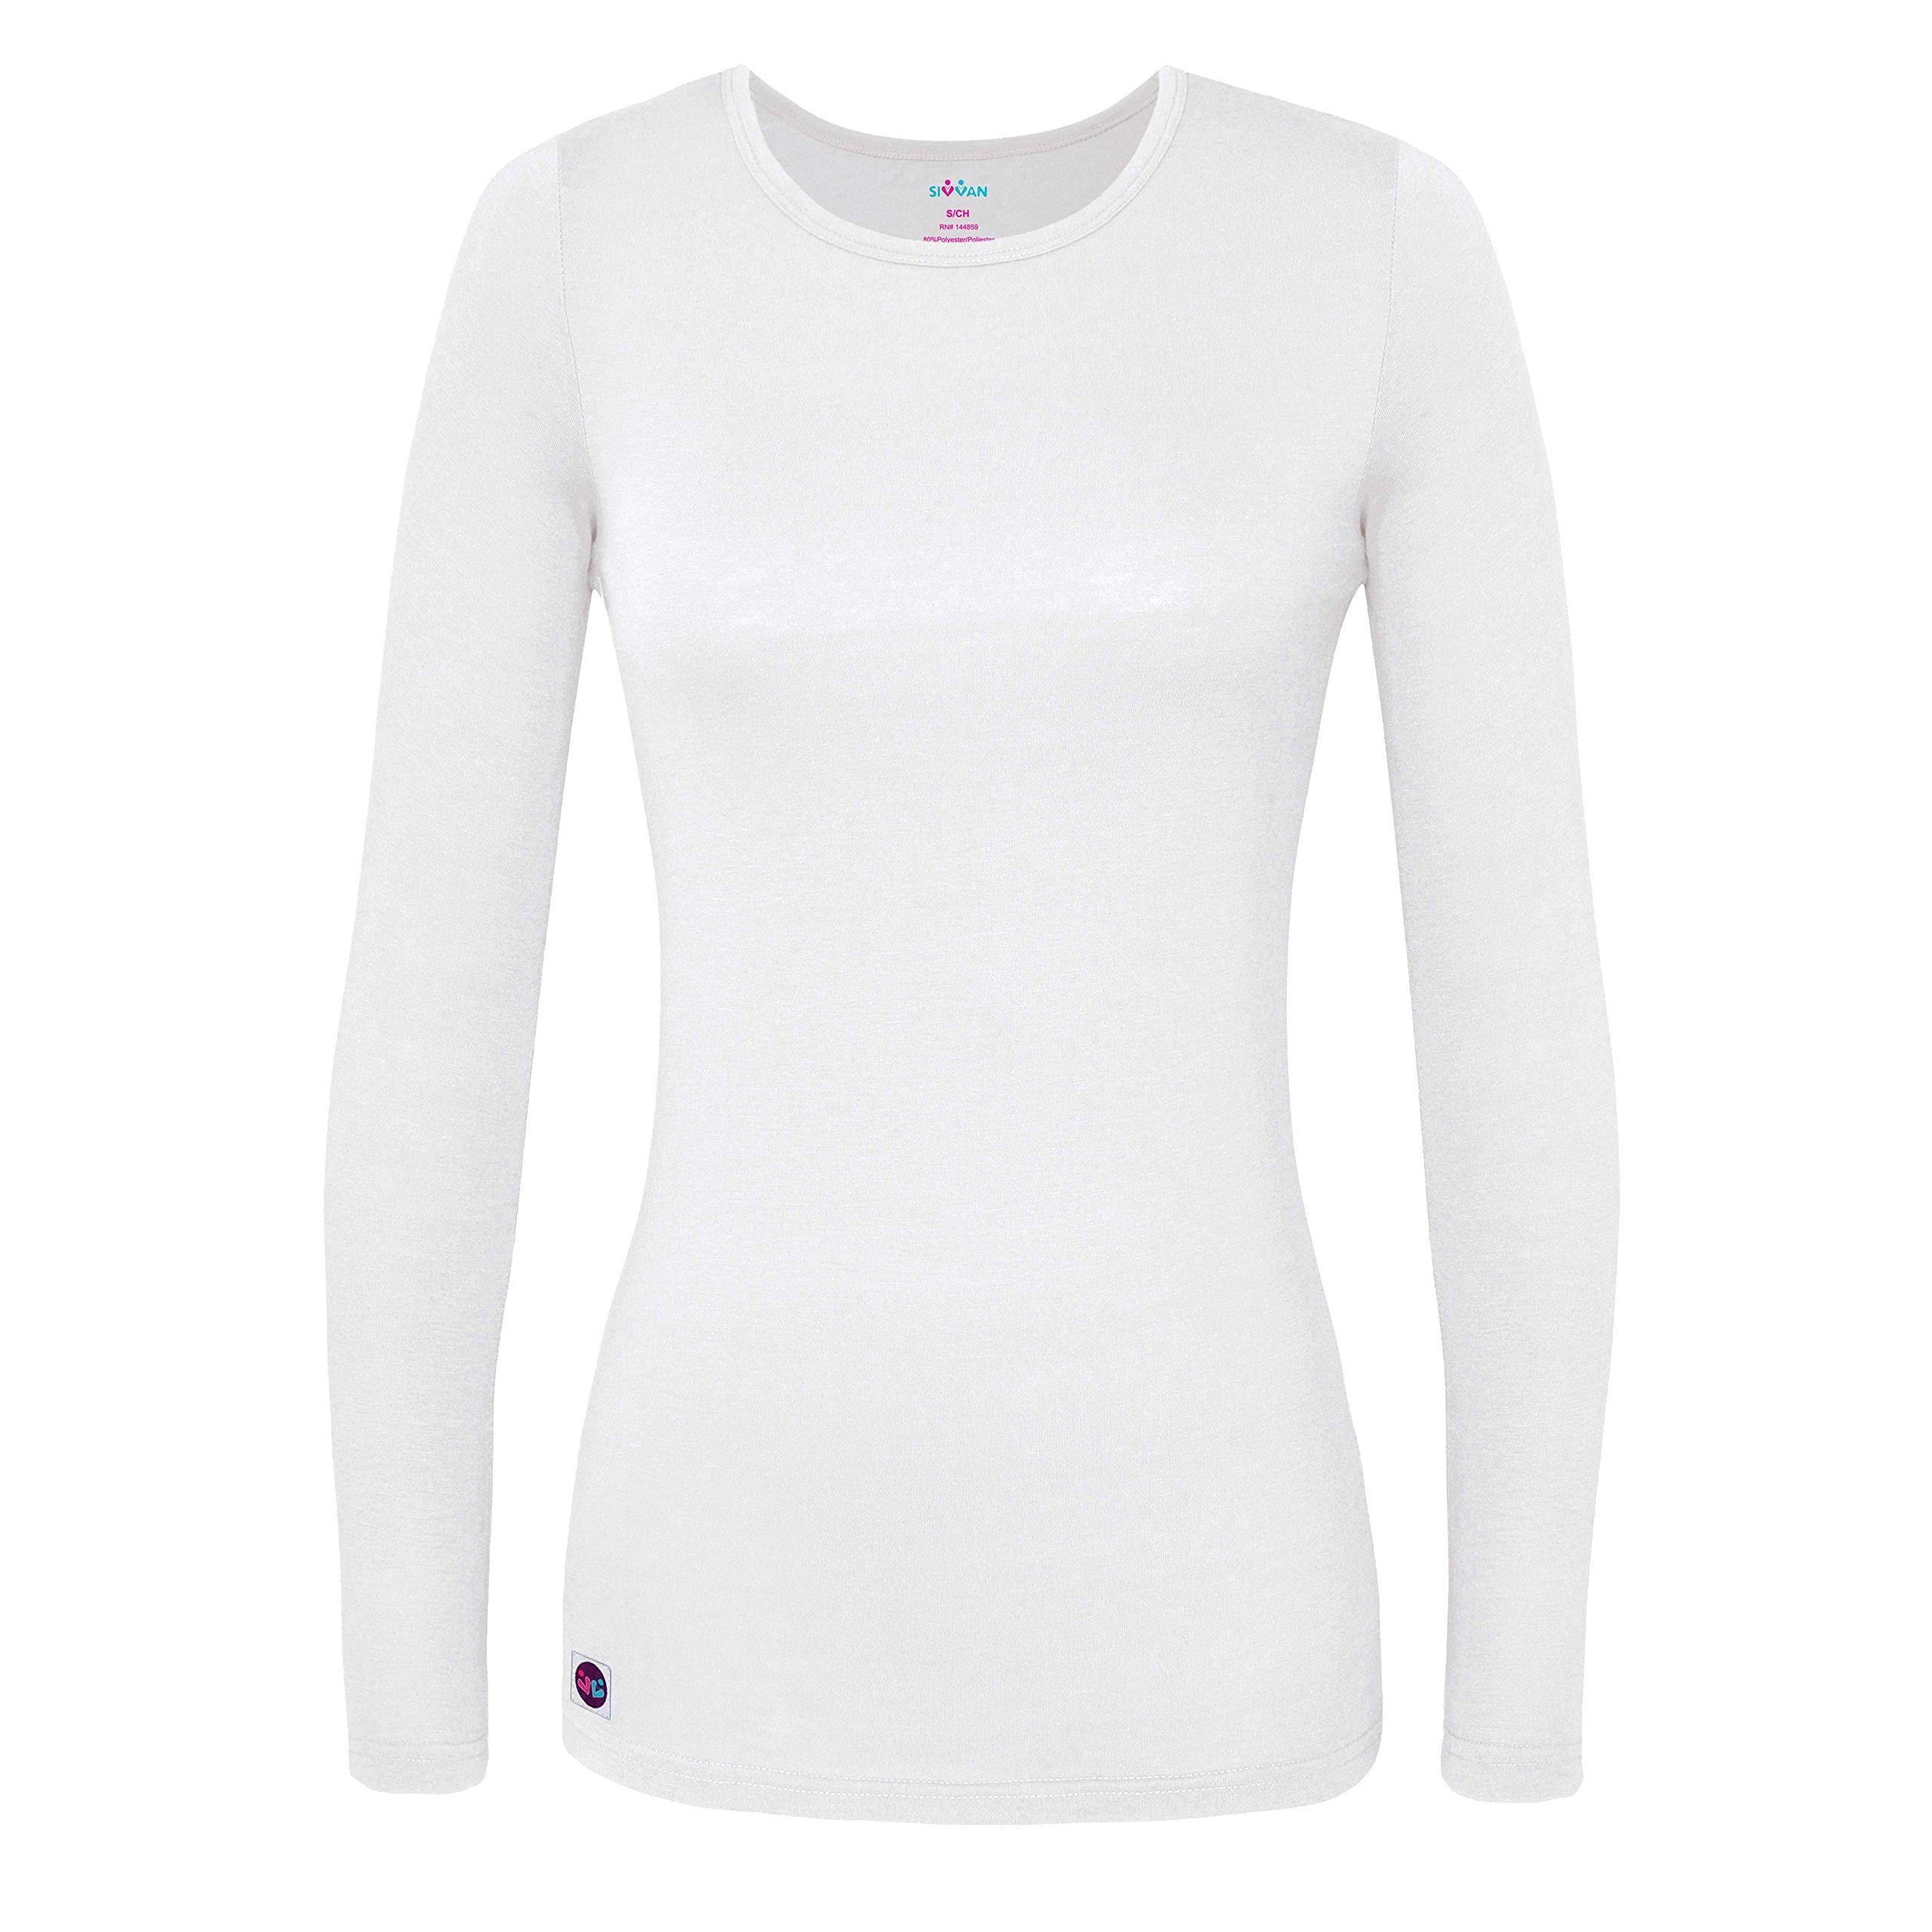 Sivvan Women's Comfort Long Sleeve T-Shirt/Underscrub Tee - S8500 - White - S by Sivvan